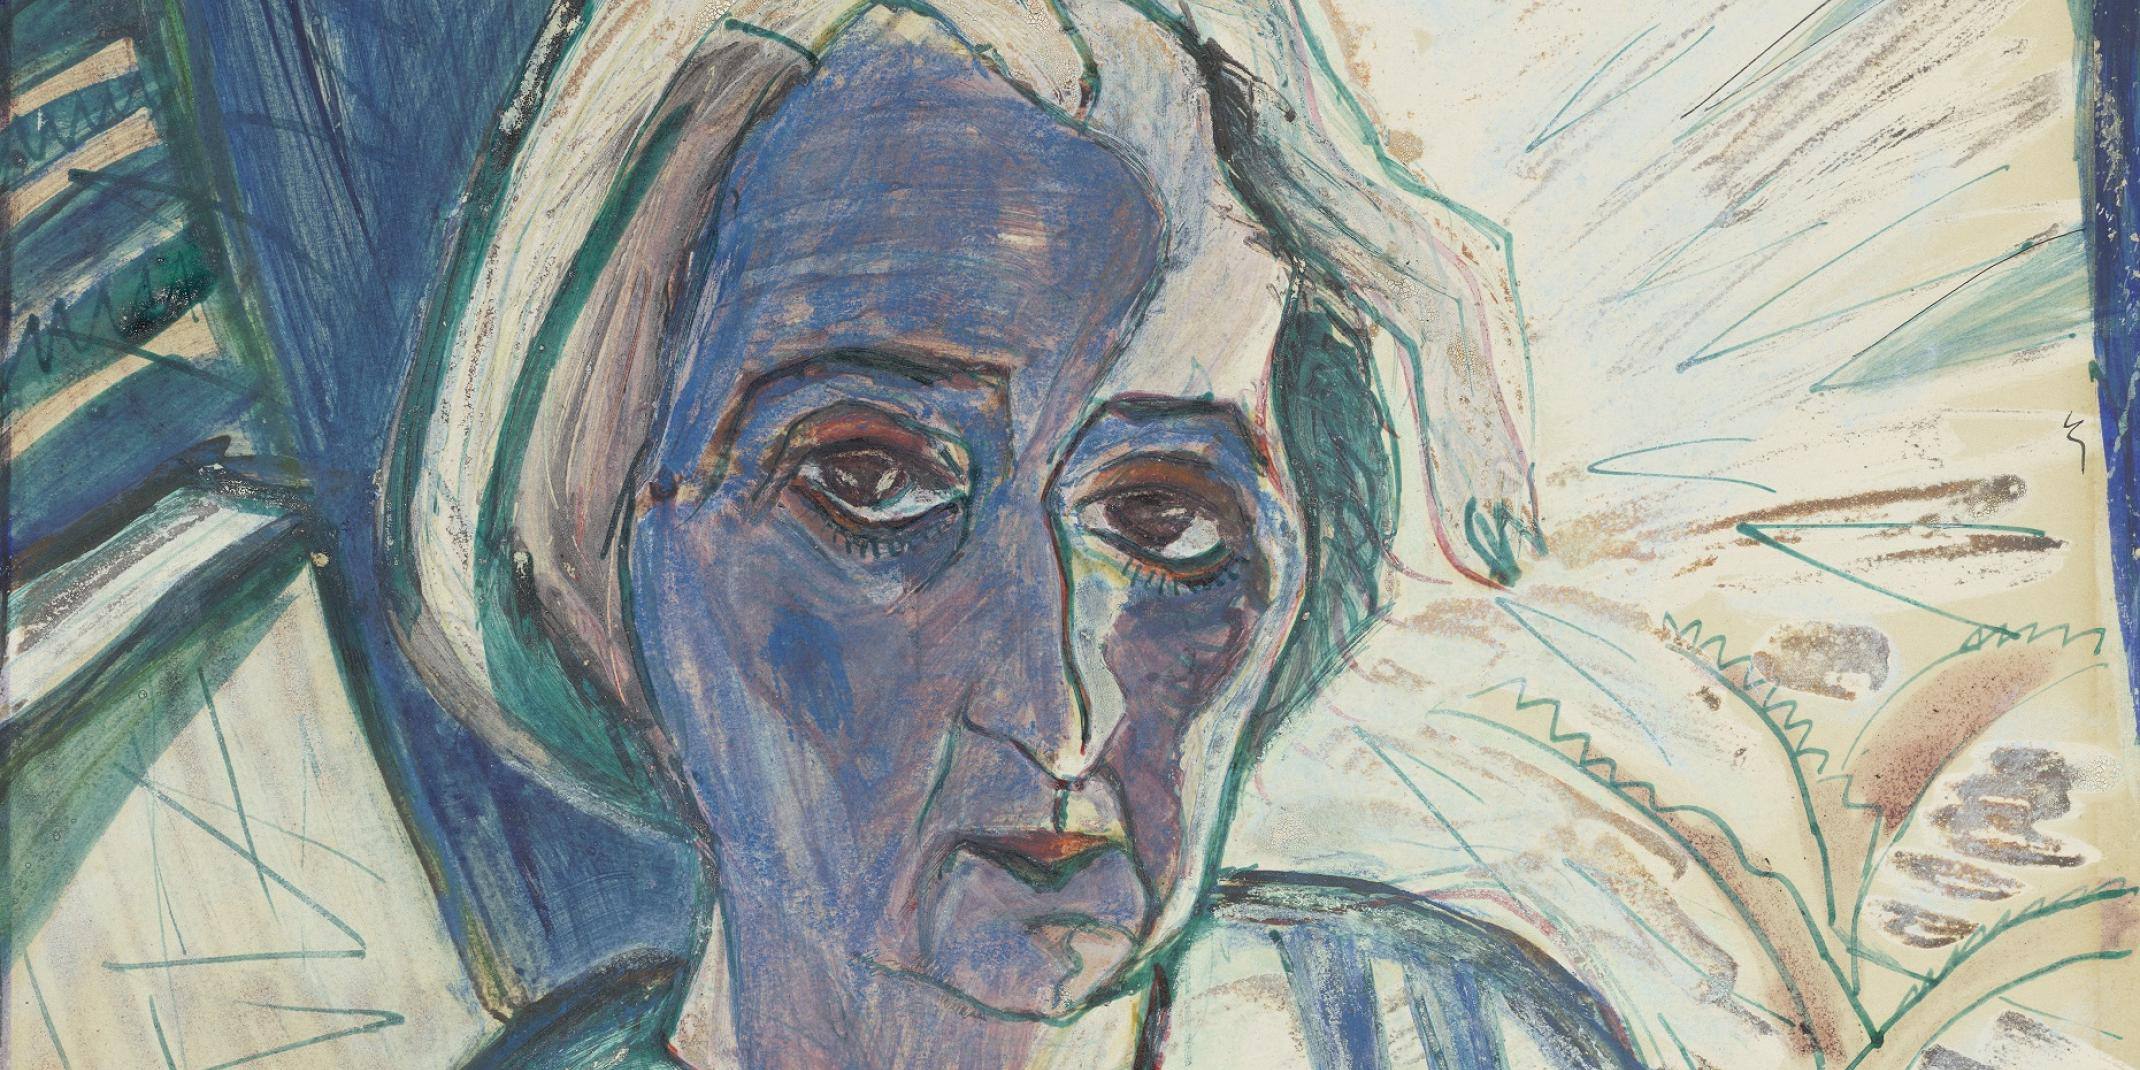 Walter Gramatté (1897 - 1929), Bildnis Rosa Schapire (1874-1954), 1920, © Hamburger Kunsthalle / bpk  Foto: Christoph Irrgang